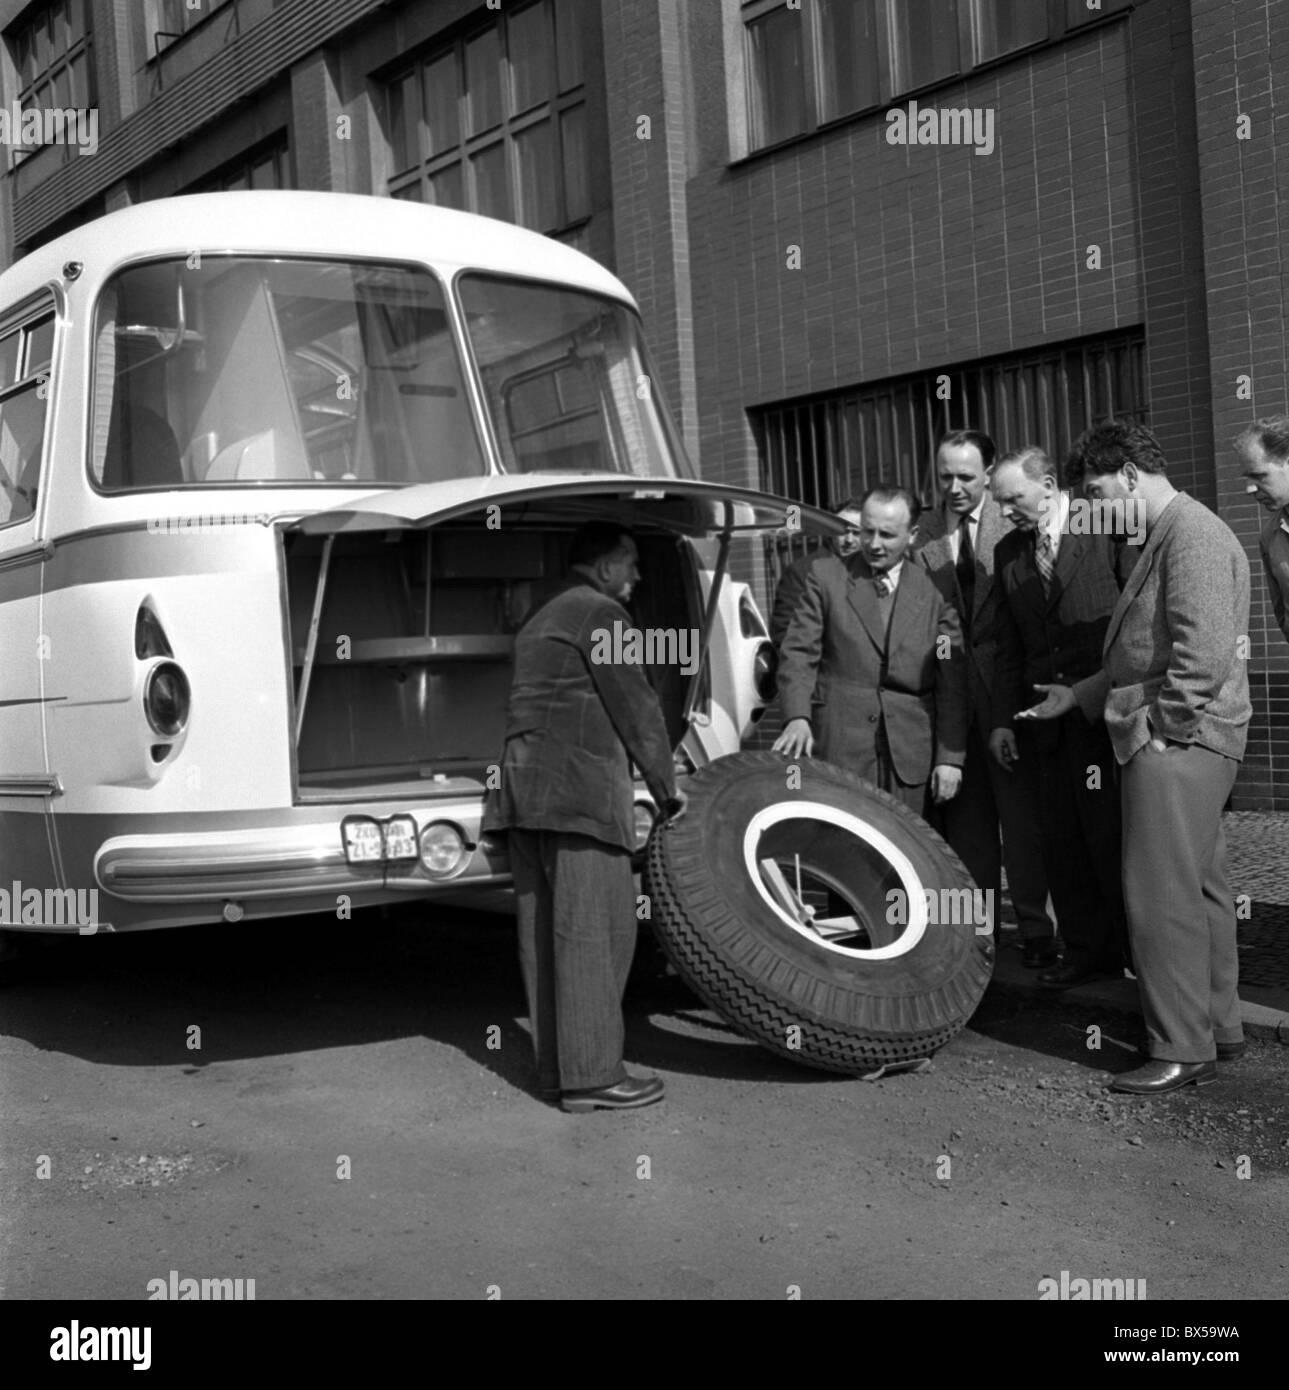 Skoda 706 RTO, flat tire, bus - Stock Image